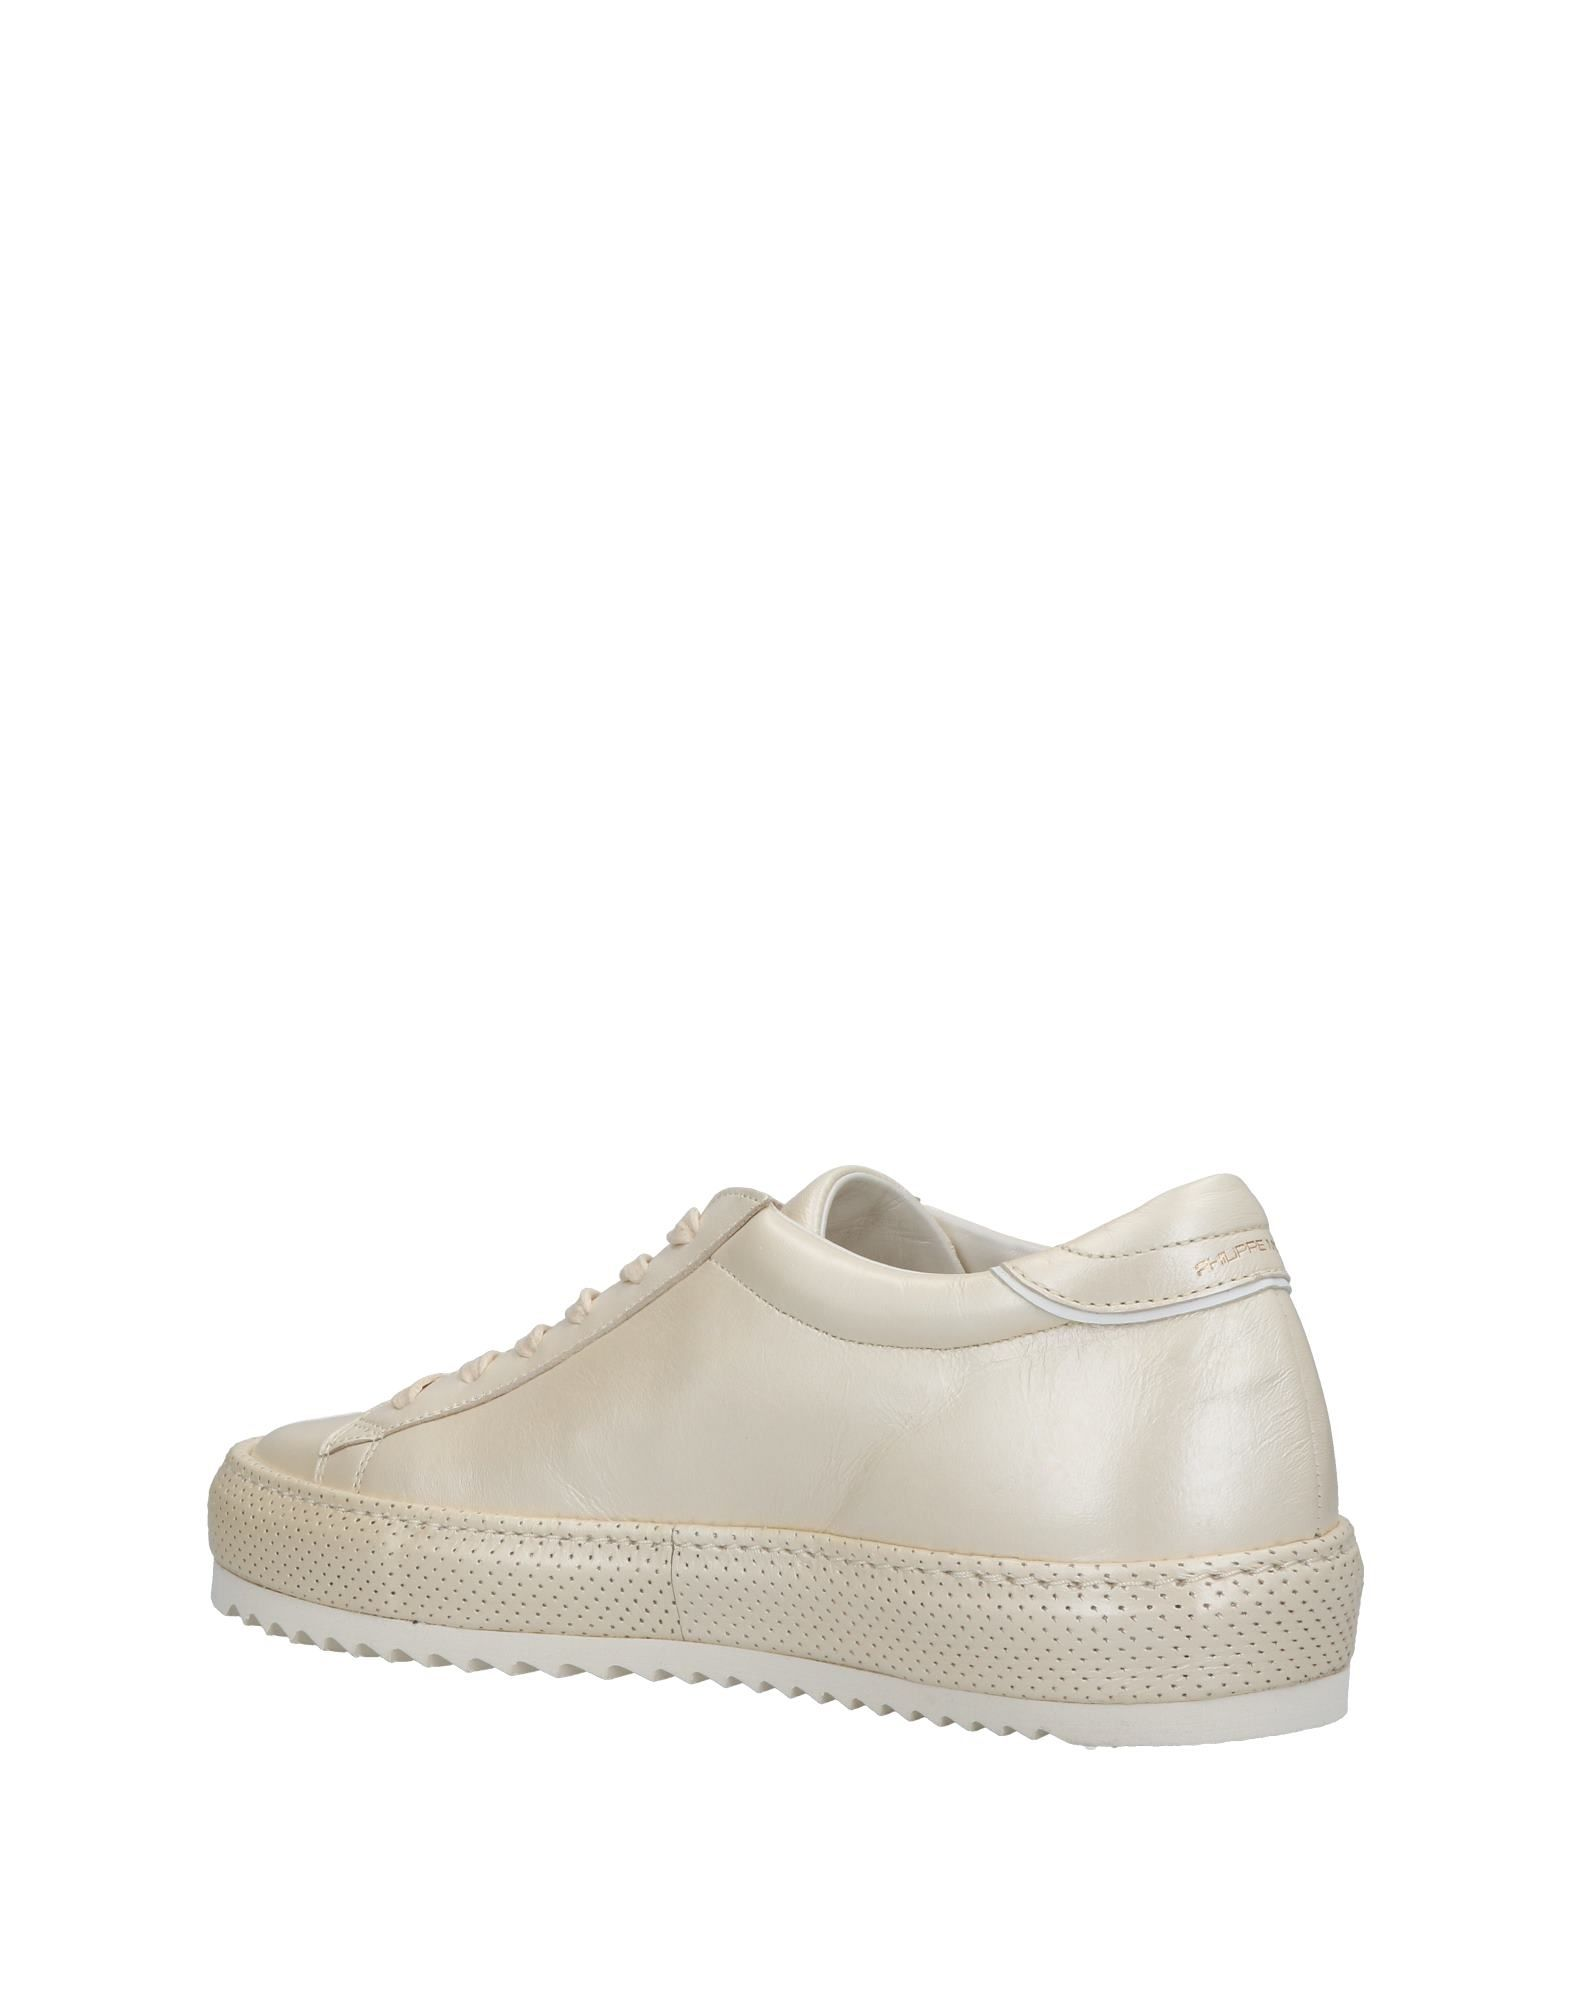 Philippe Damen Model Sneakers Damen Philippe  11393124BS Beliebte Schuhe 886fec